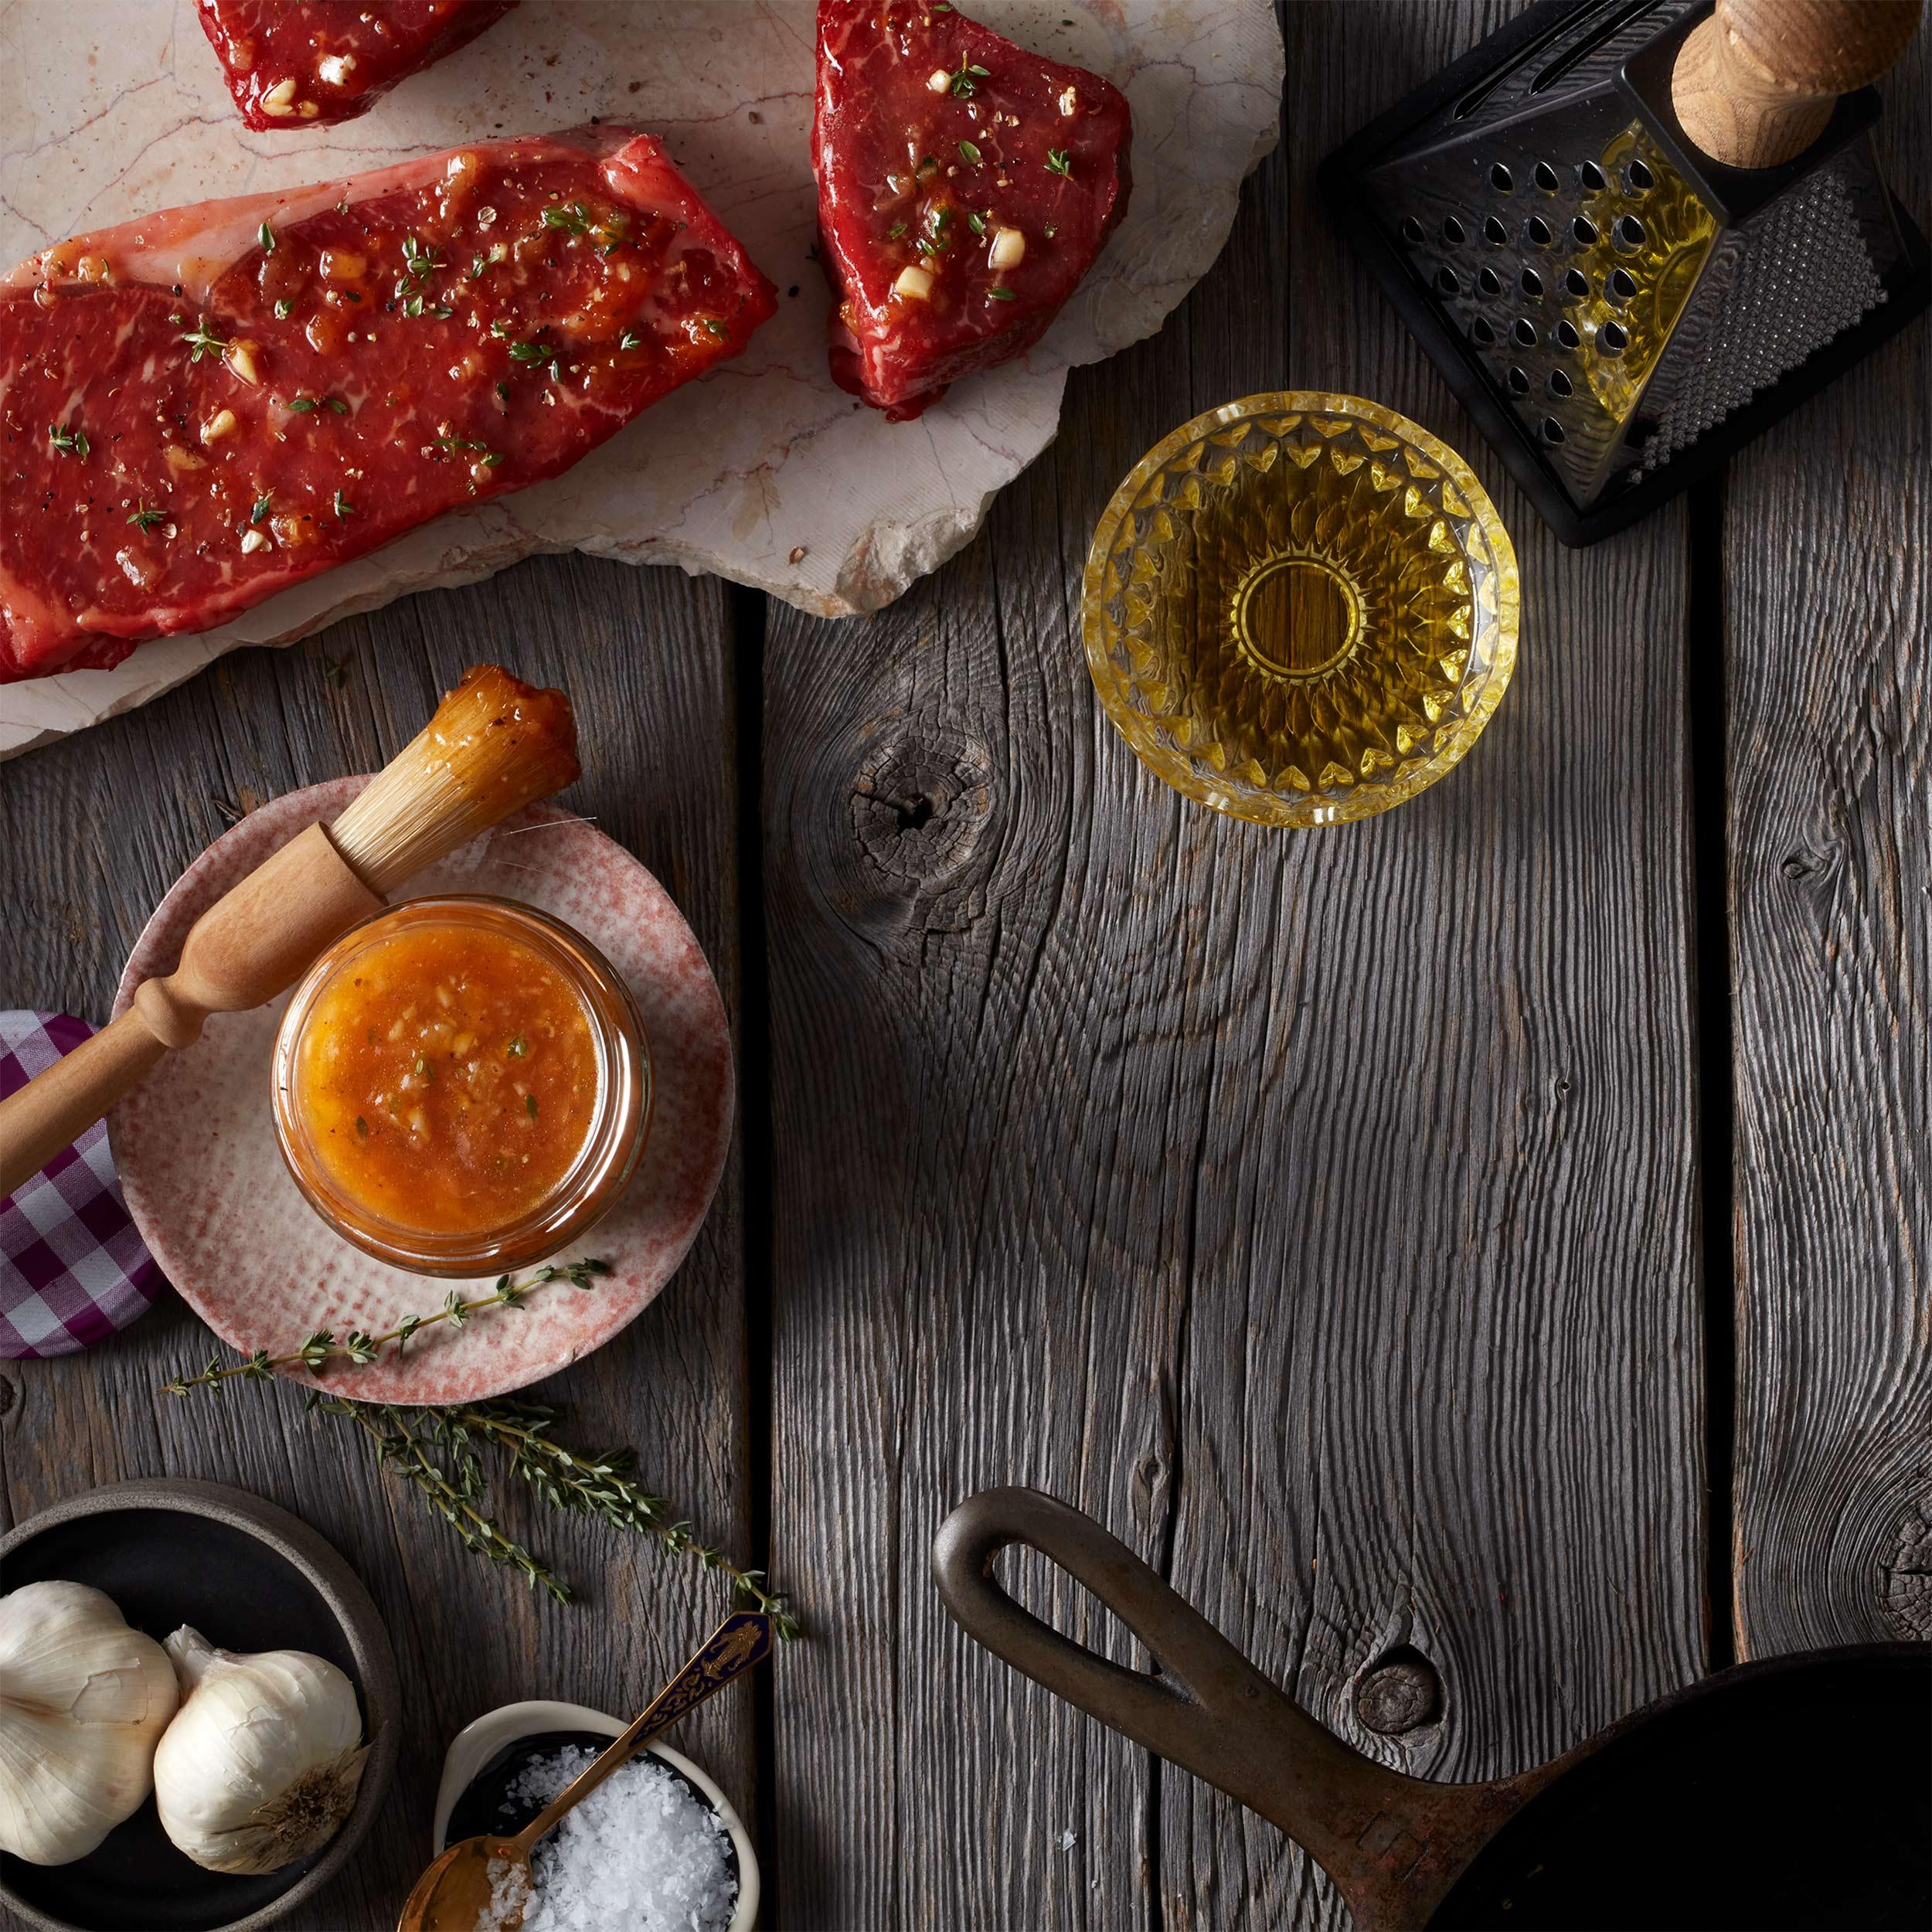 apricot marinade spread